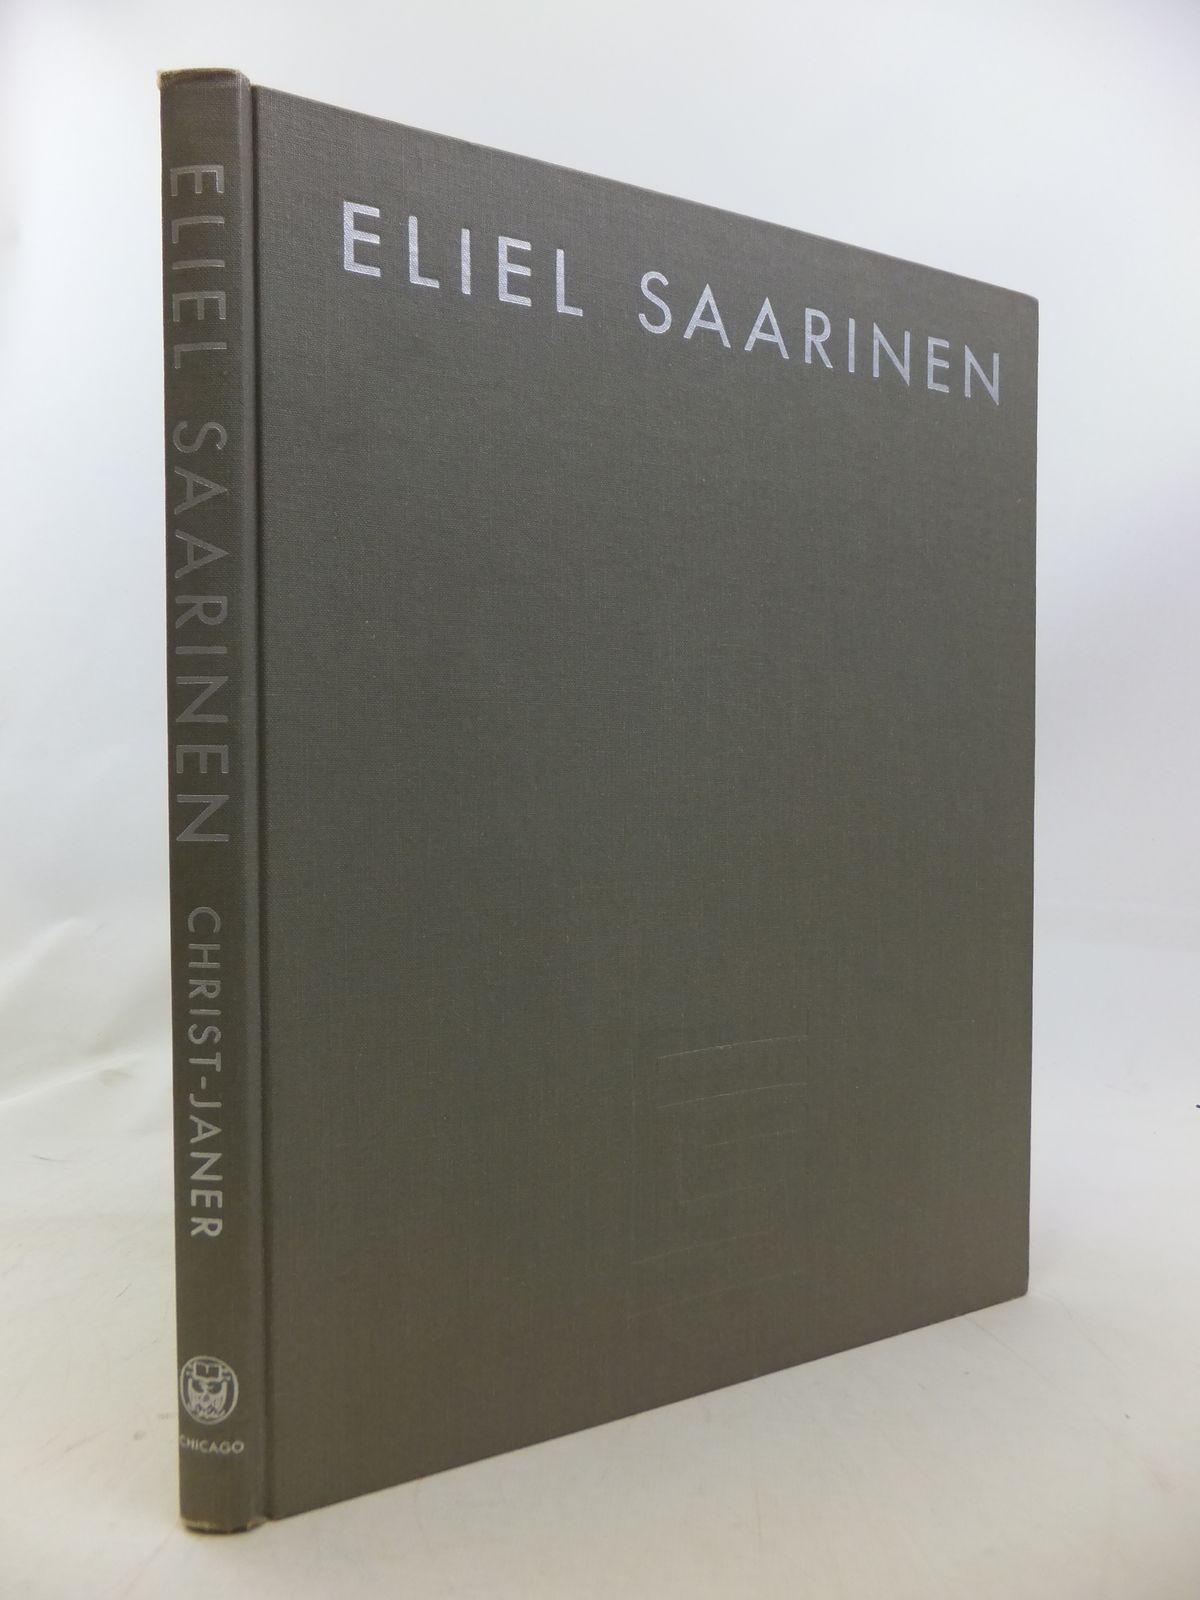 Photo of ELIEL SAARINEN: FINNISH-AMERICAN ARCHITECT AND EDUCATOR- Stock Number: 1809327